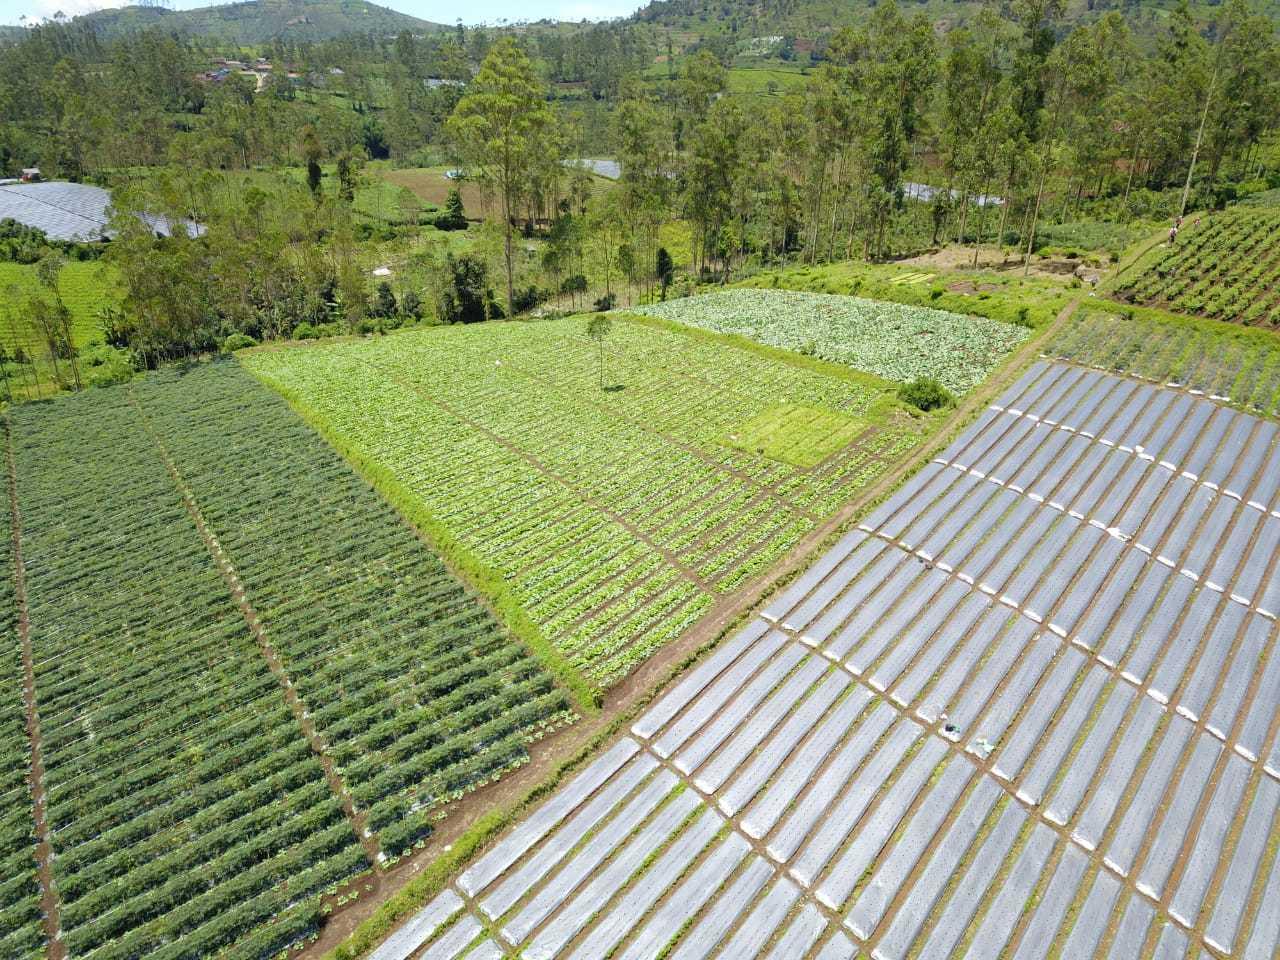 Kementan Bangun 2.358 Kampung Holtikultura pada 2022